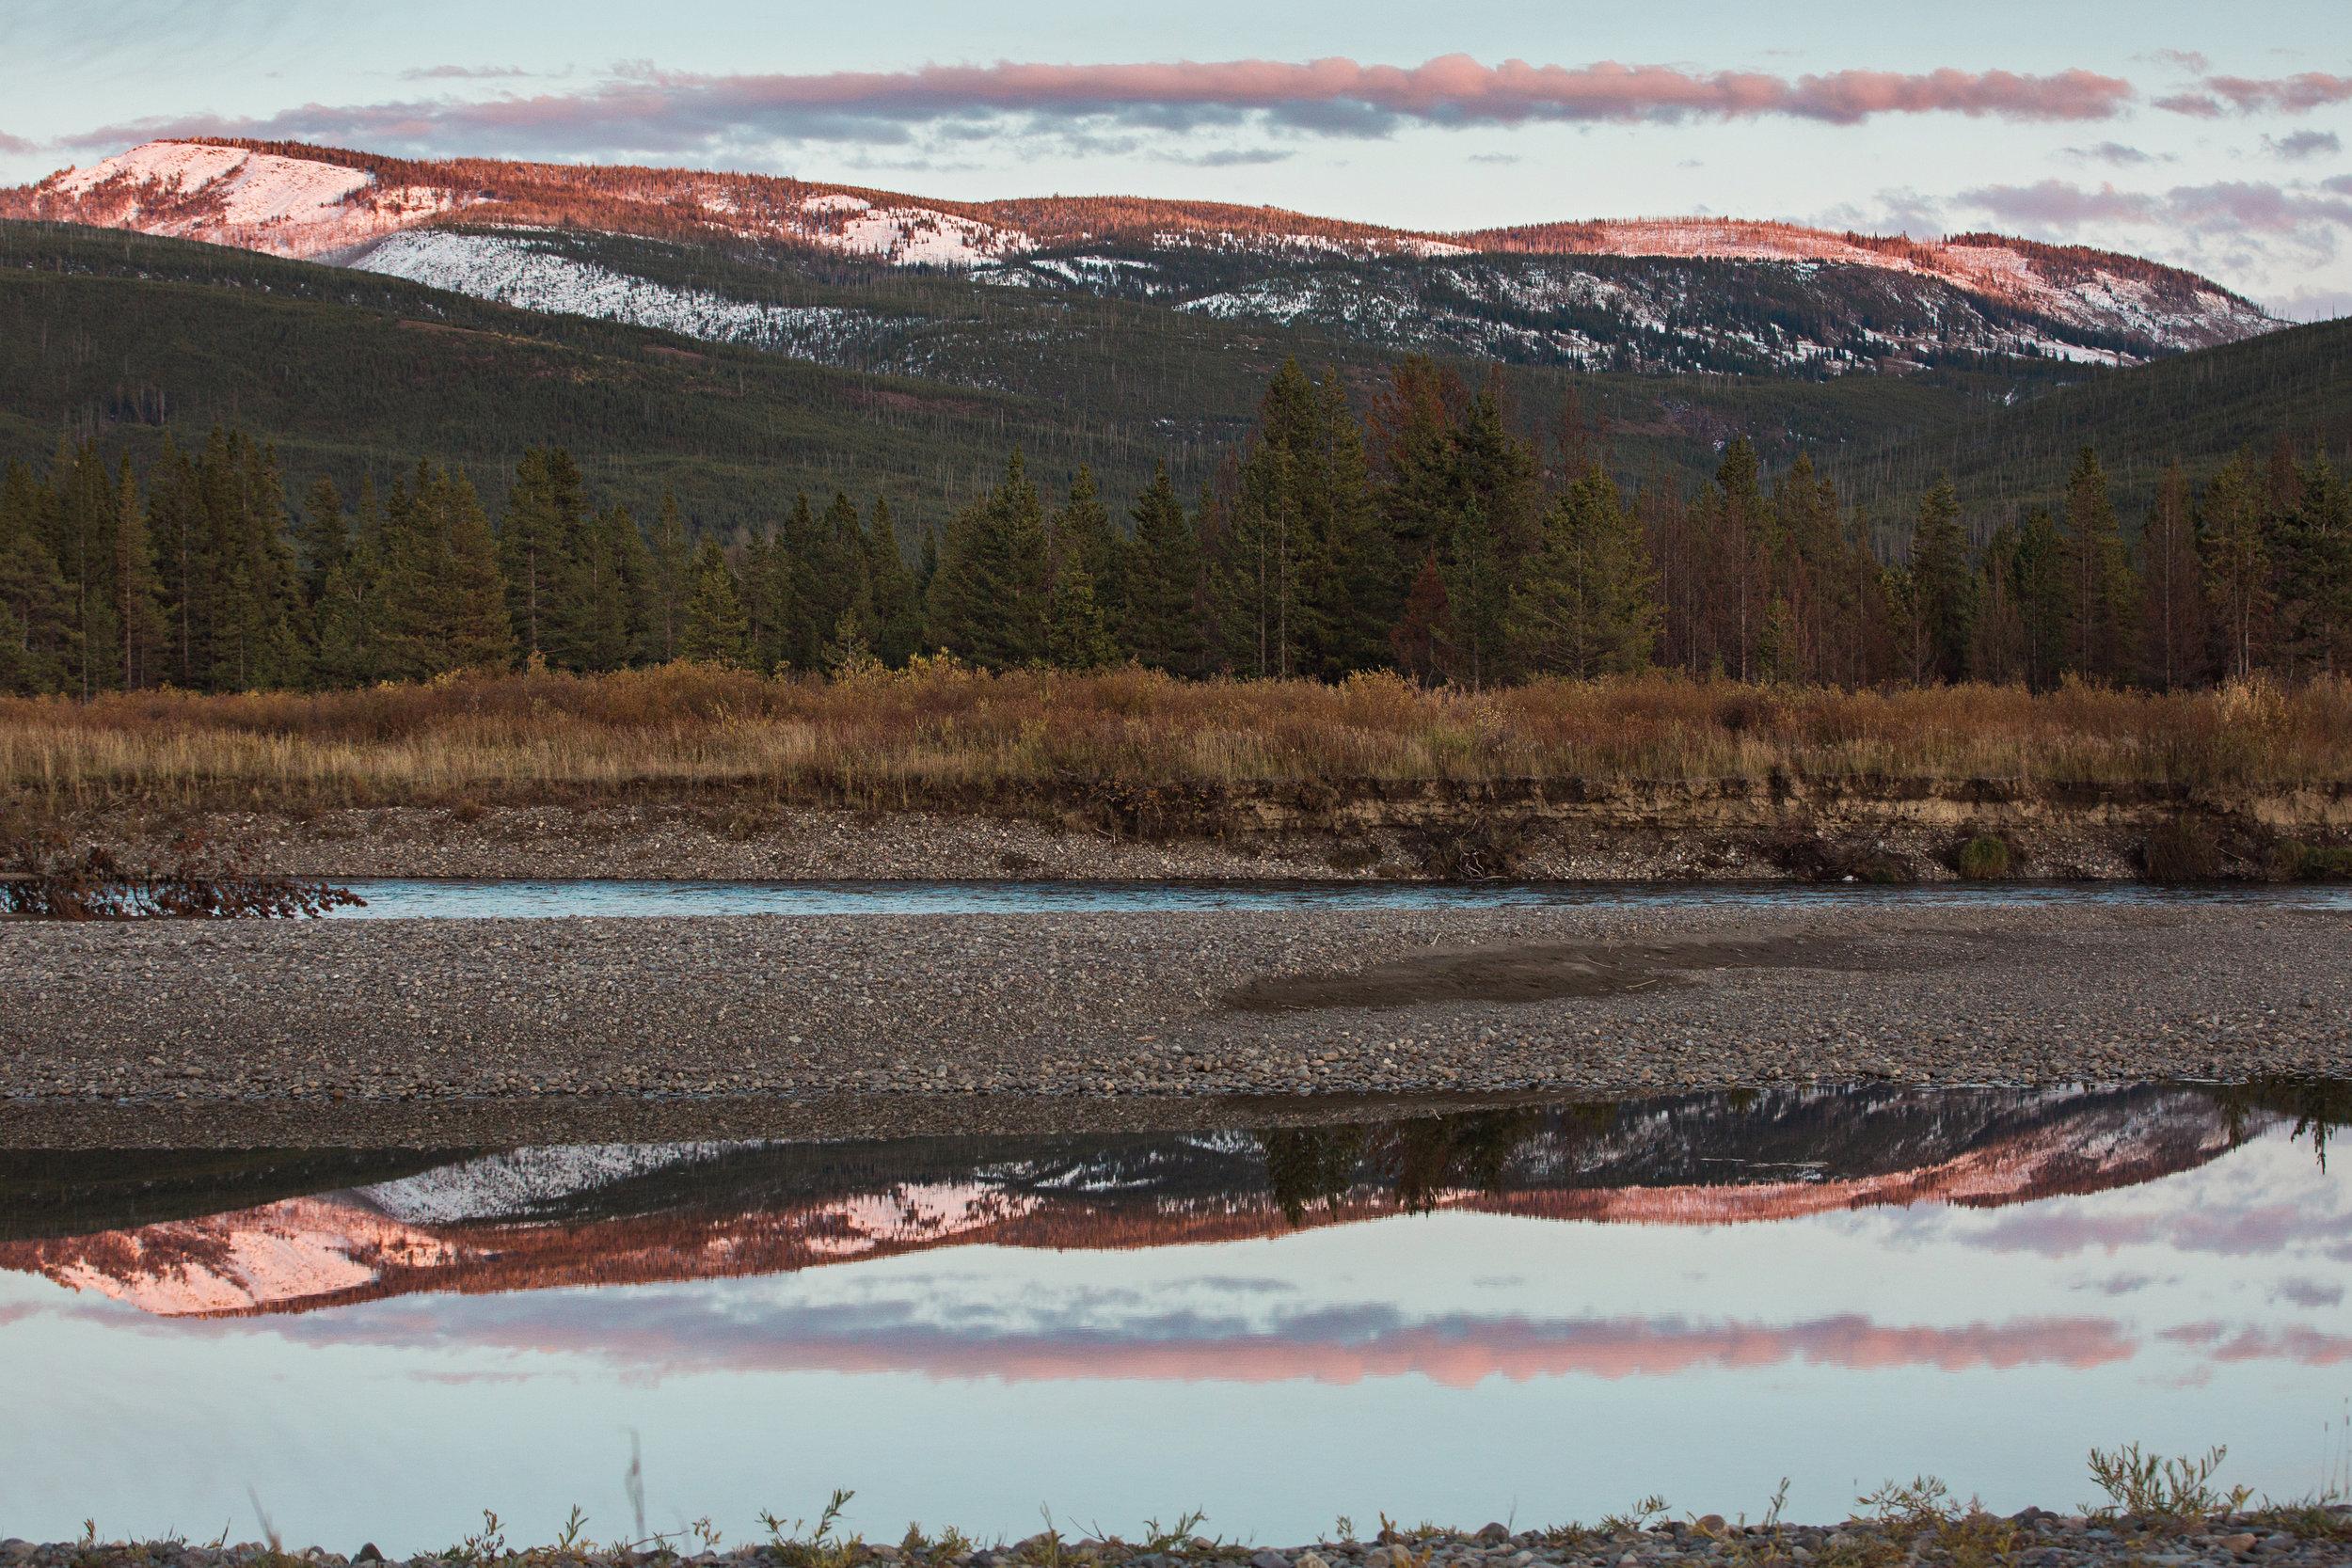 CindyGiovagnoli_Yellowstone_Grand_Teton_National_Park_Wyoming_mountains_deer_sunset_fall_autumn_October_alpenglow-007.jpg